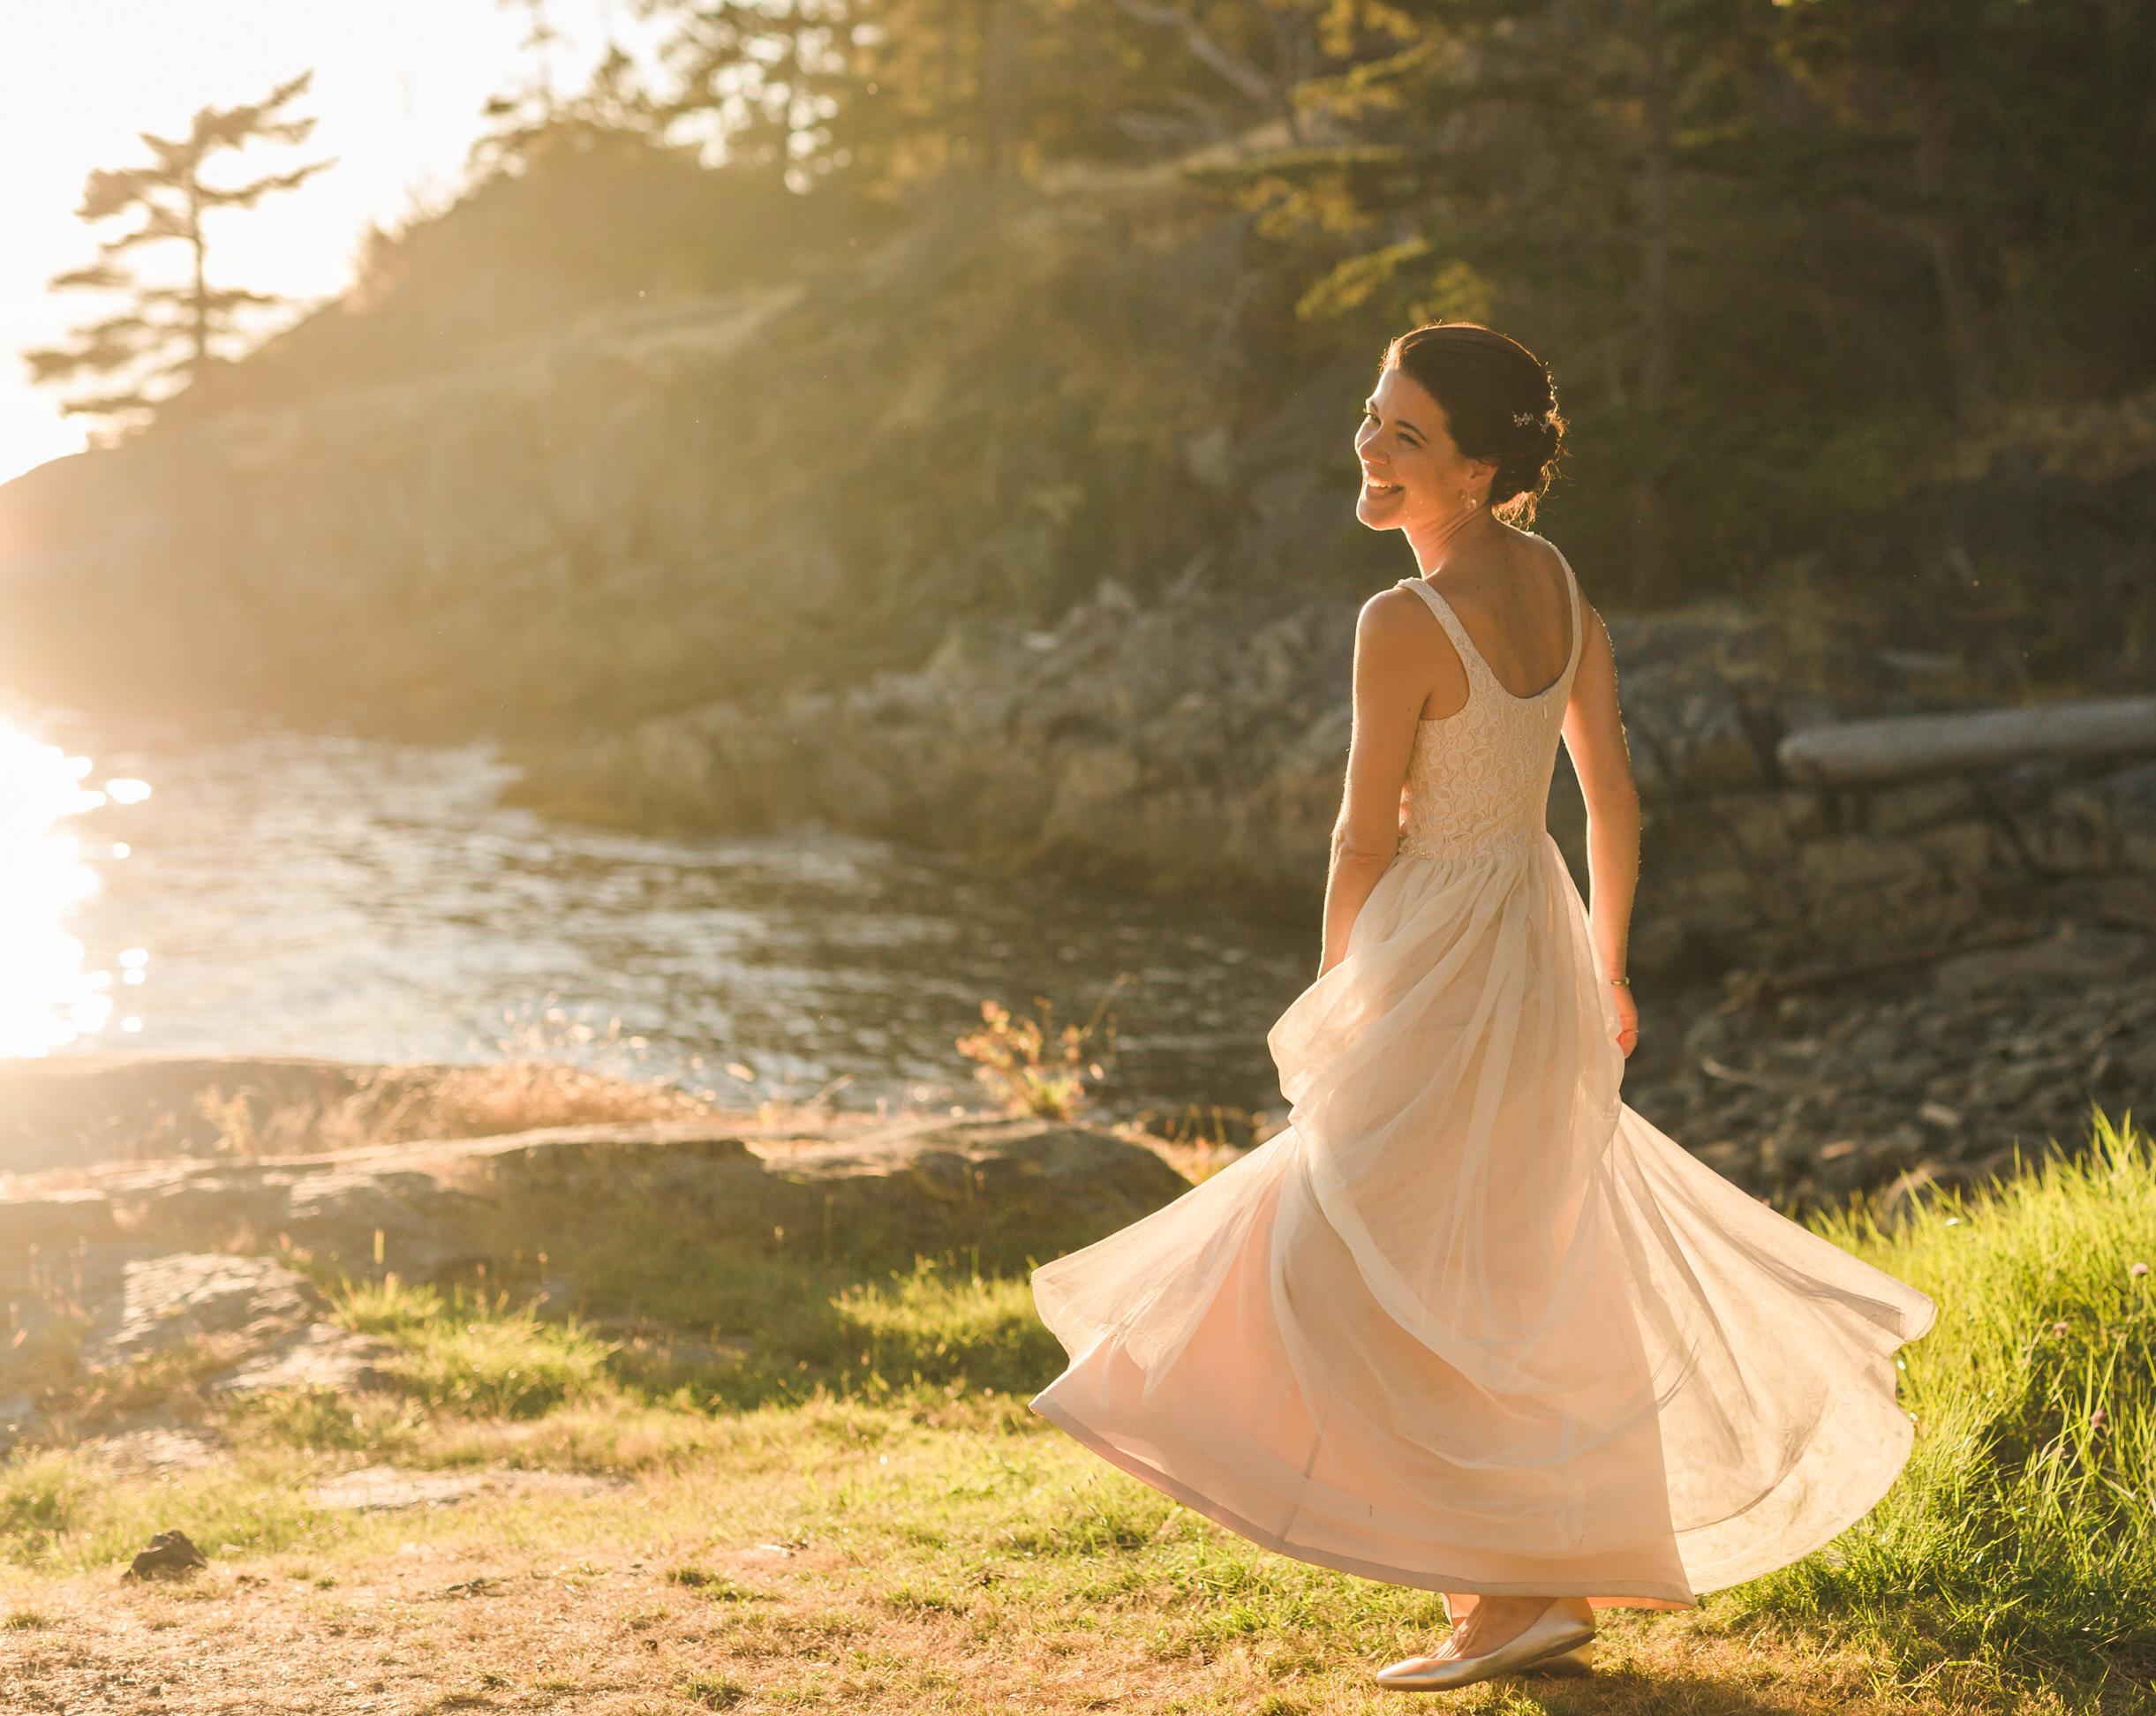 Rockwater Secret Cove Resort Wedding - Sunshine Coast BC Wedding Photographer - Vancouver Wedding Photographer - Sunshine Coast Elopement Photos - IMG_1537.jpg